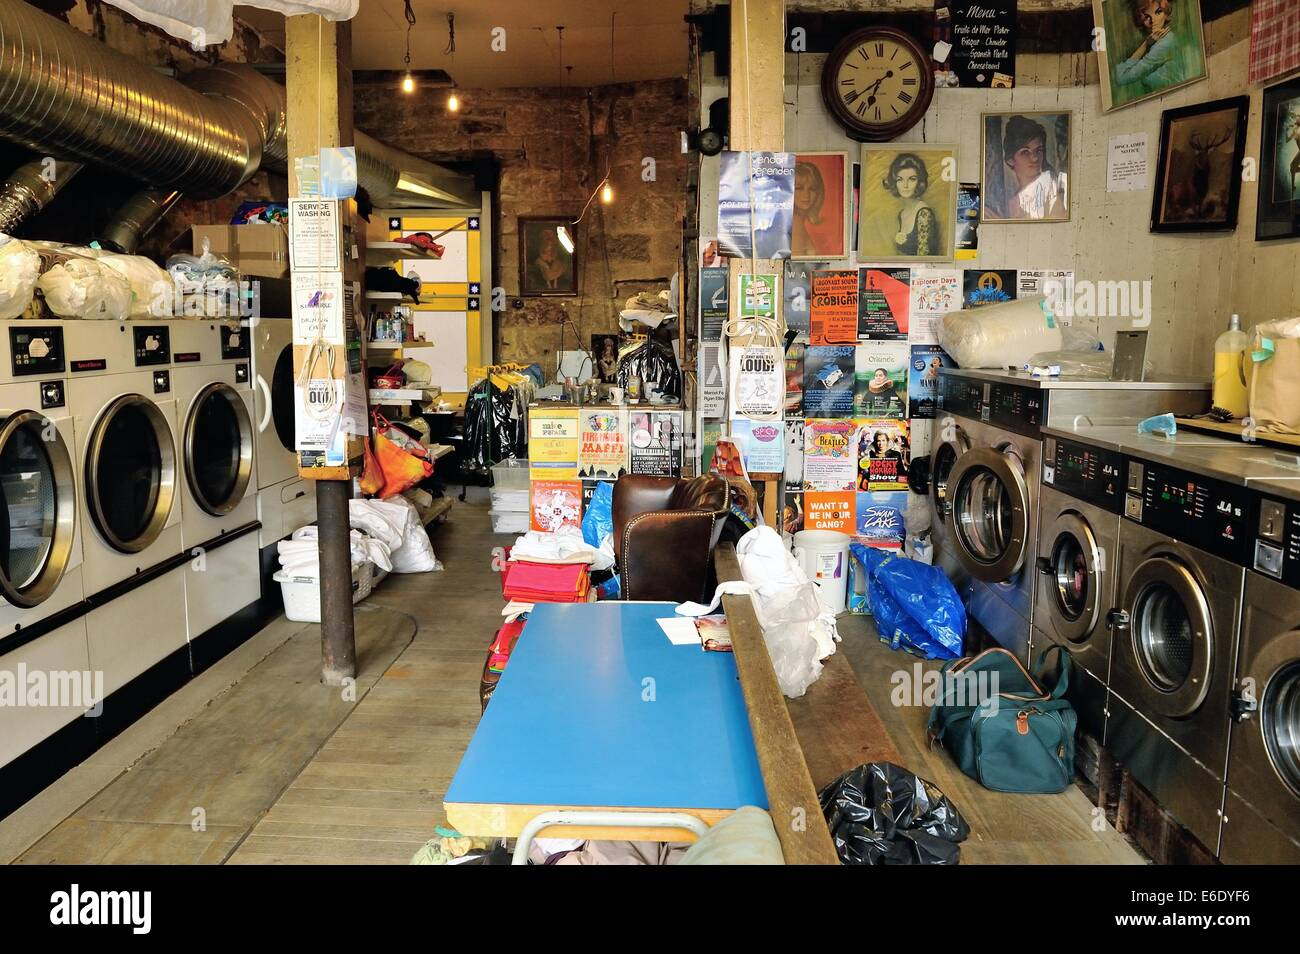 Interior of laundrette - Stock Image